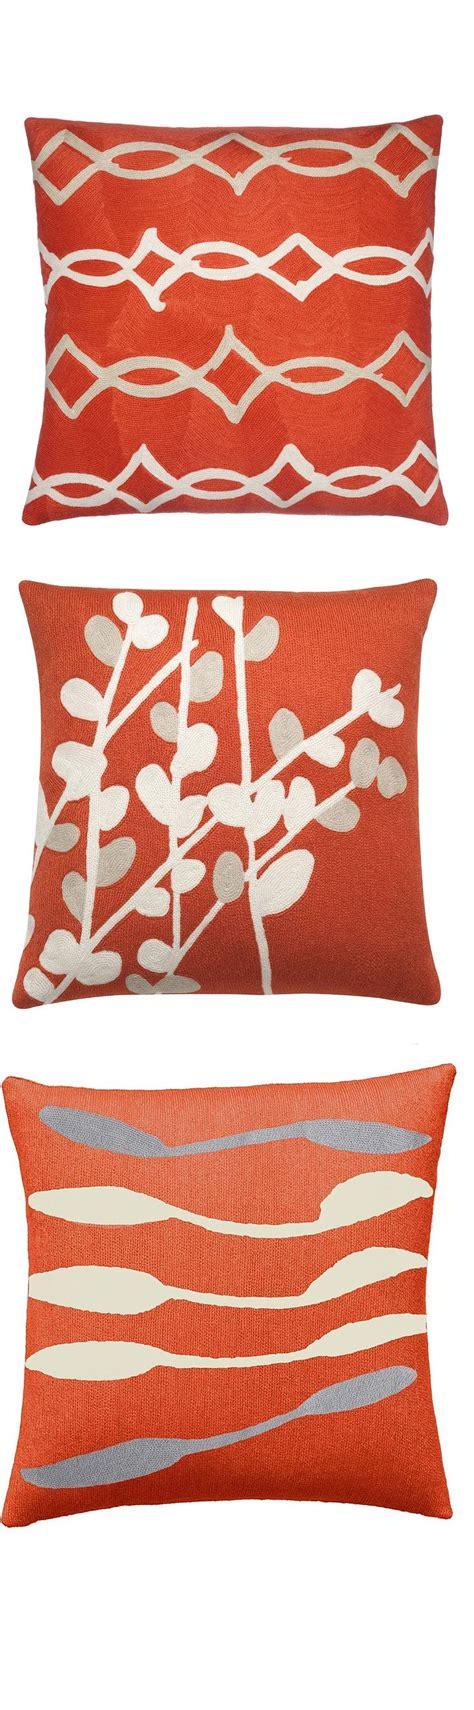 9 Best Images About Orange Pillows On Pinterest Sofa Orange Pillows For Sofa